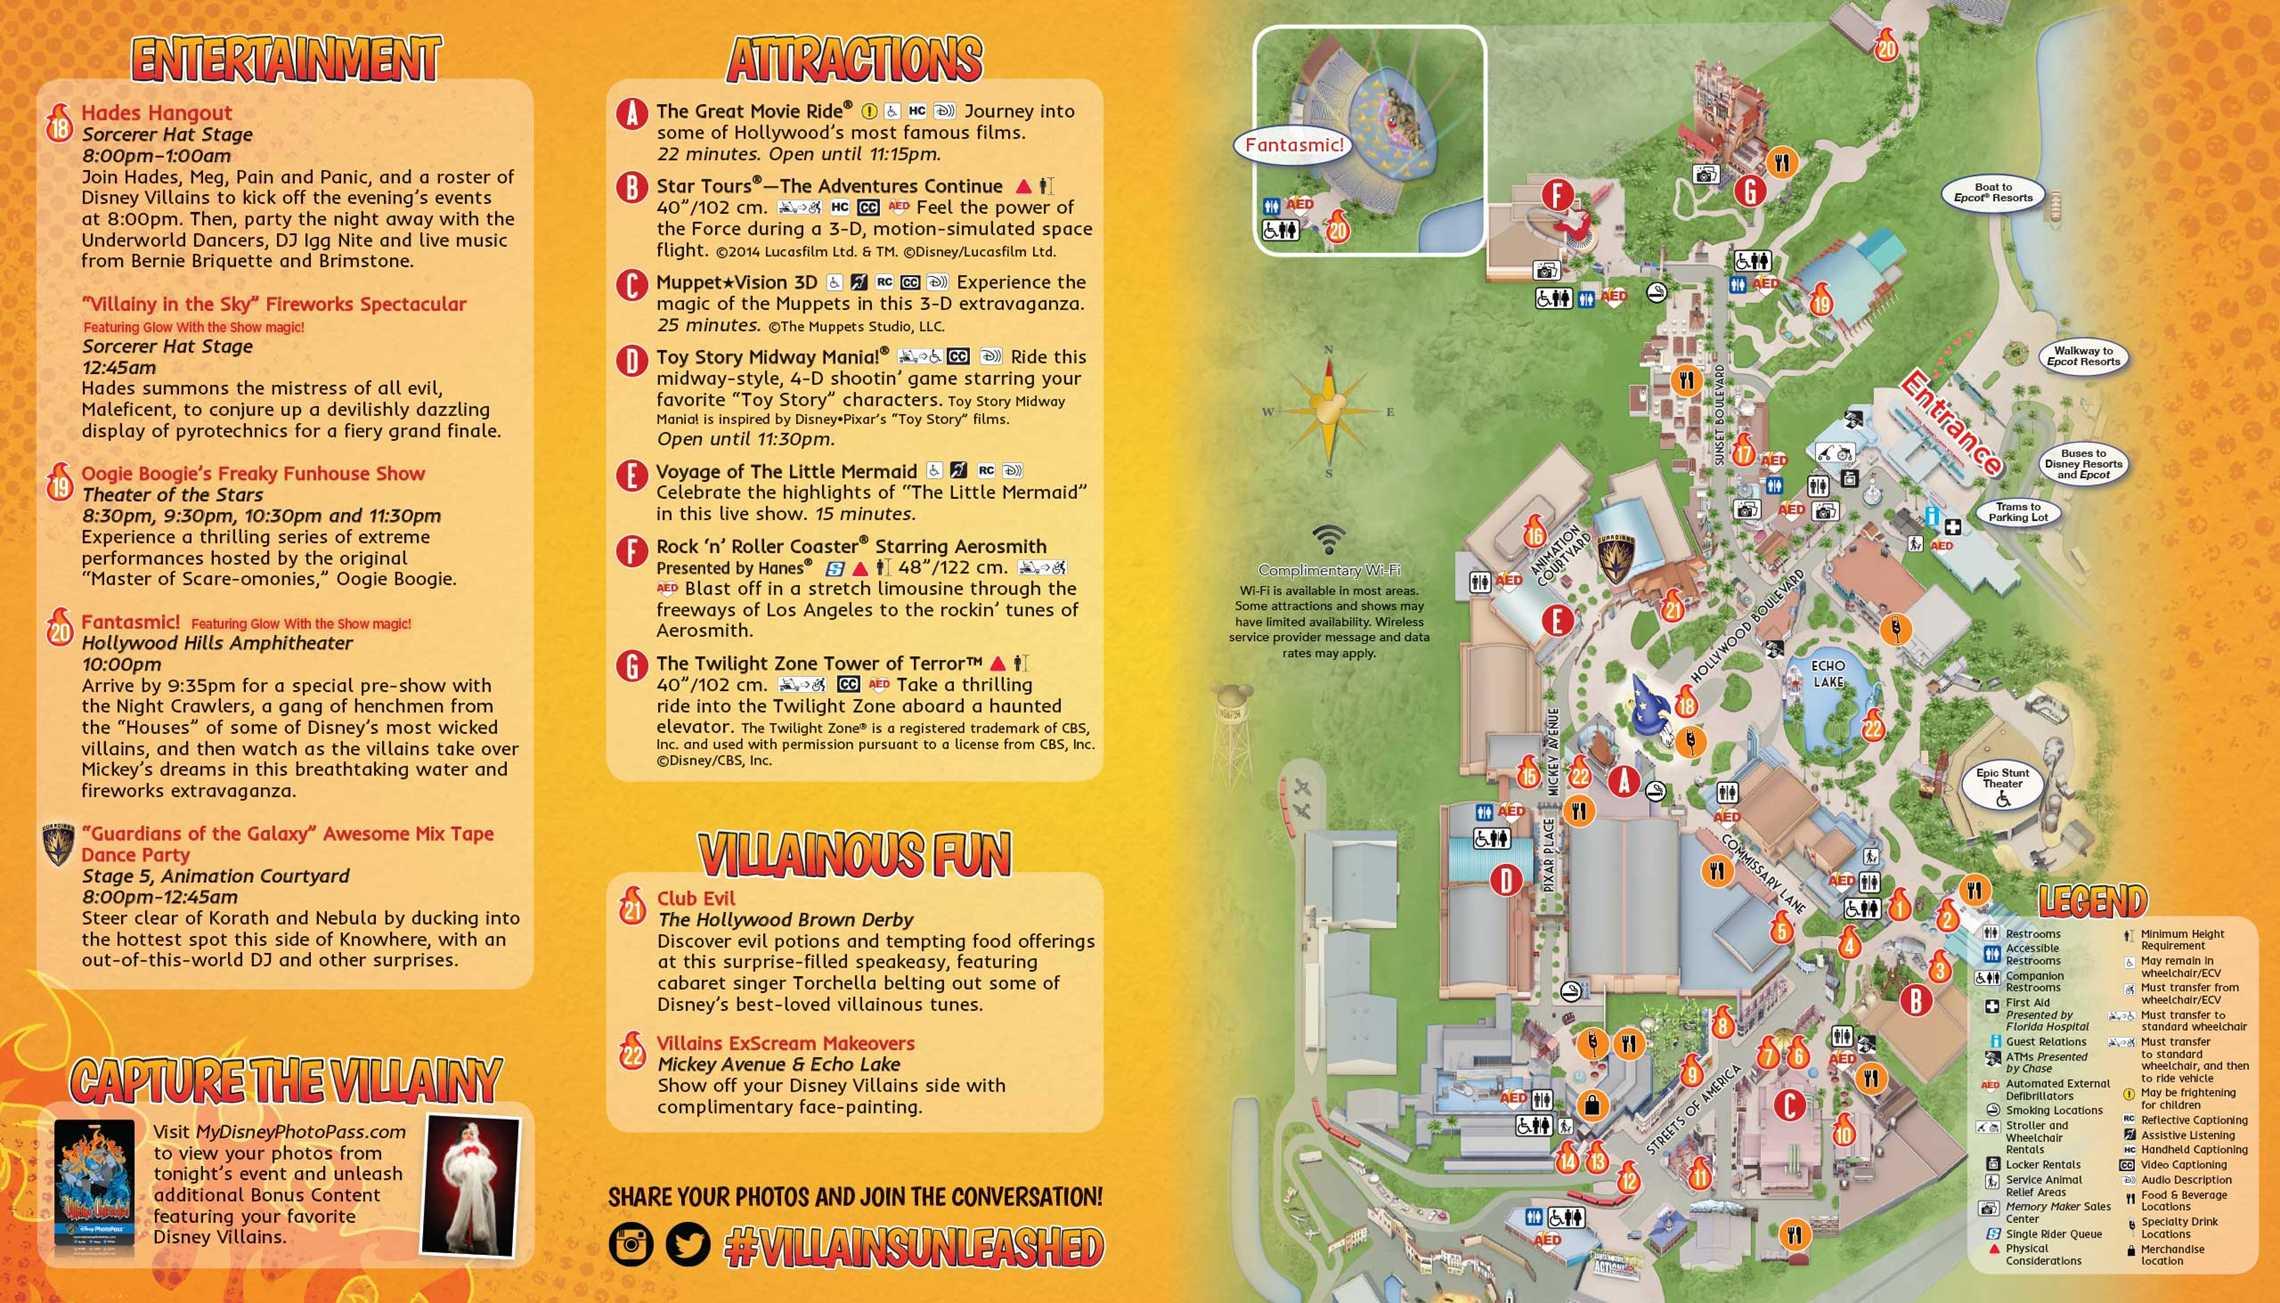 Villains Unleashed guide map - back